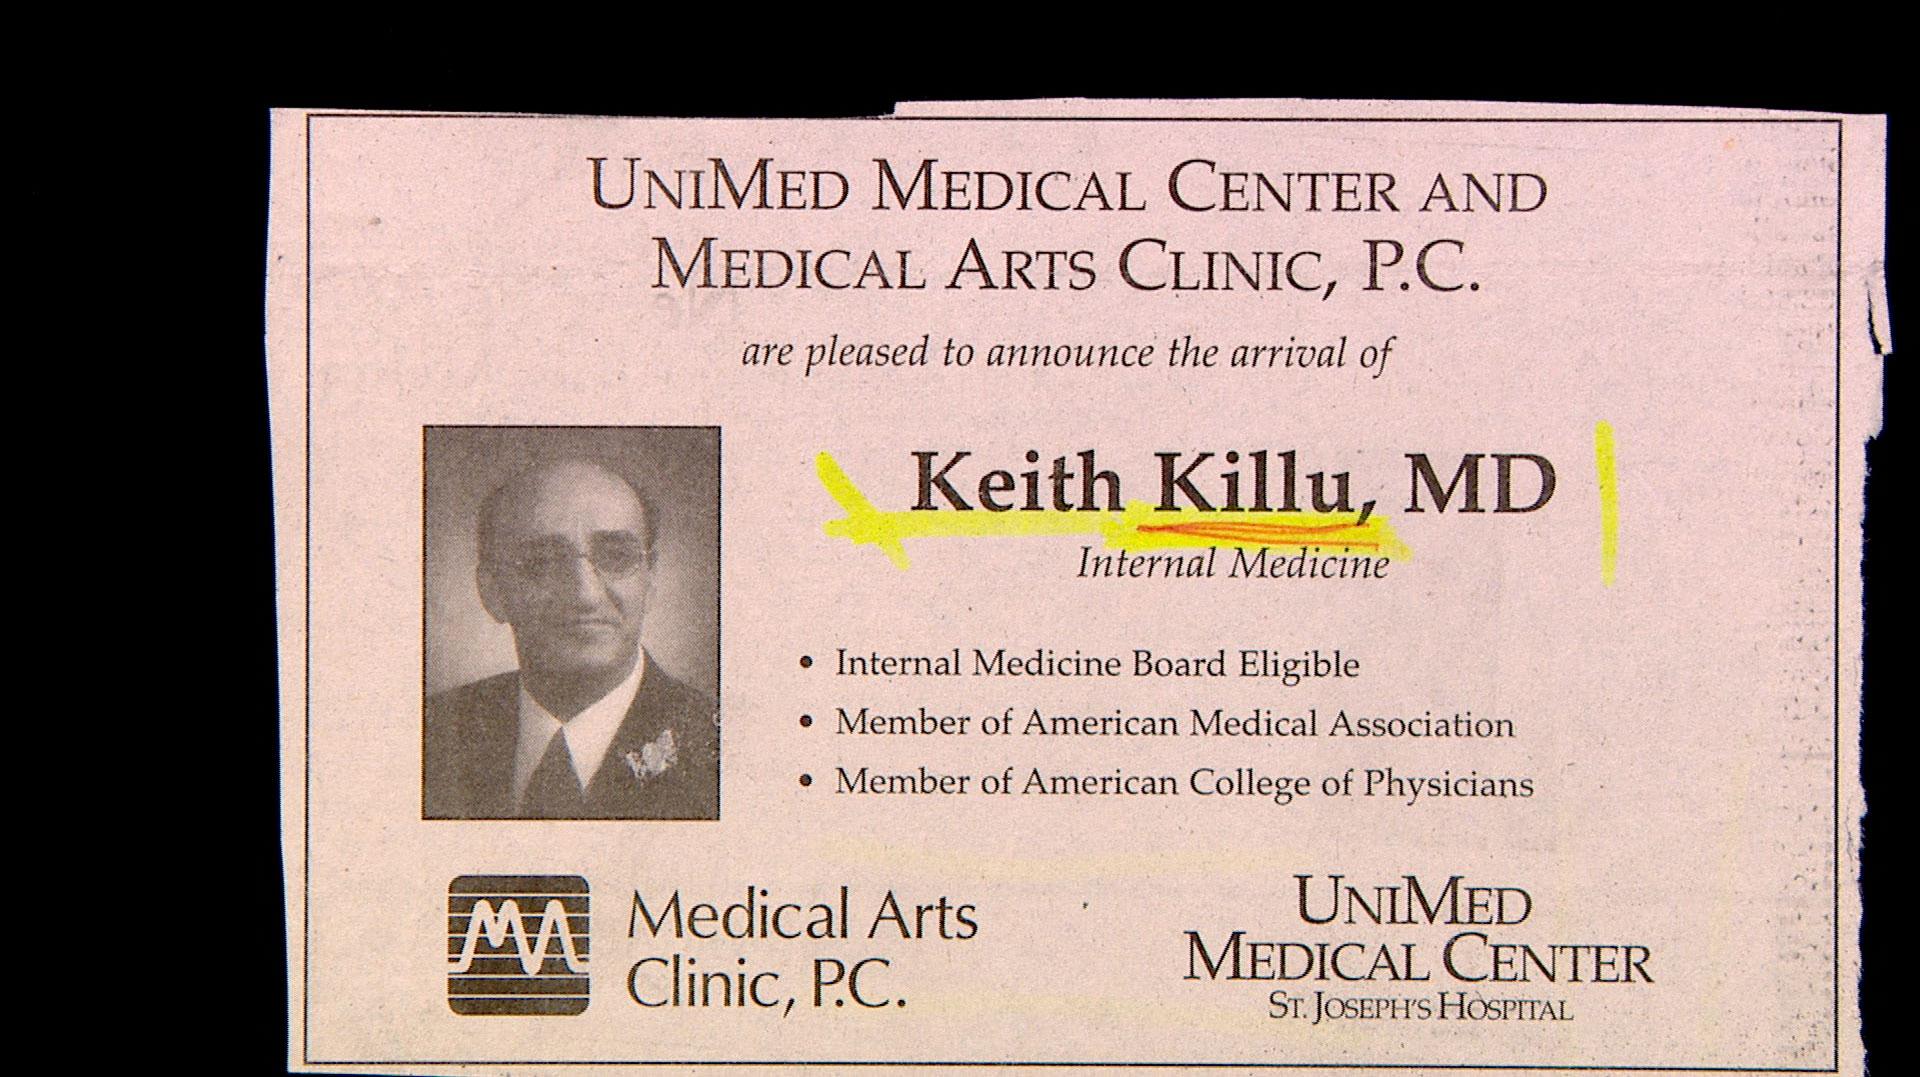 Dr. Keith Killu